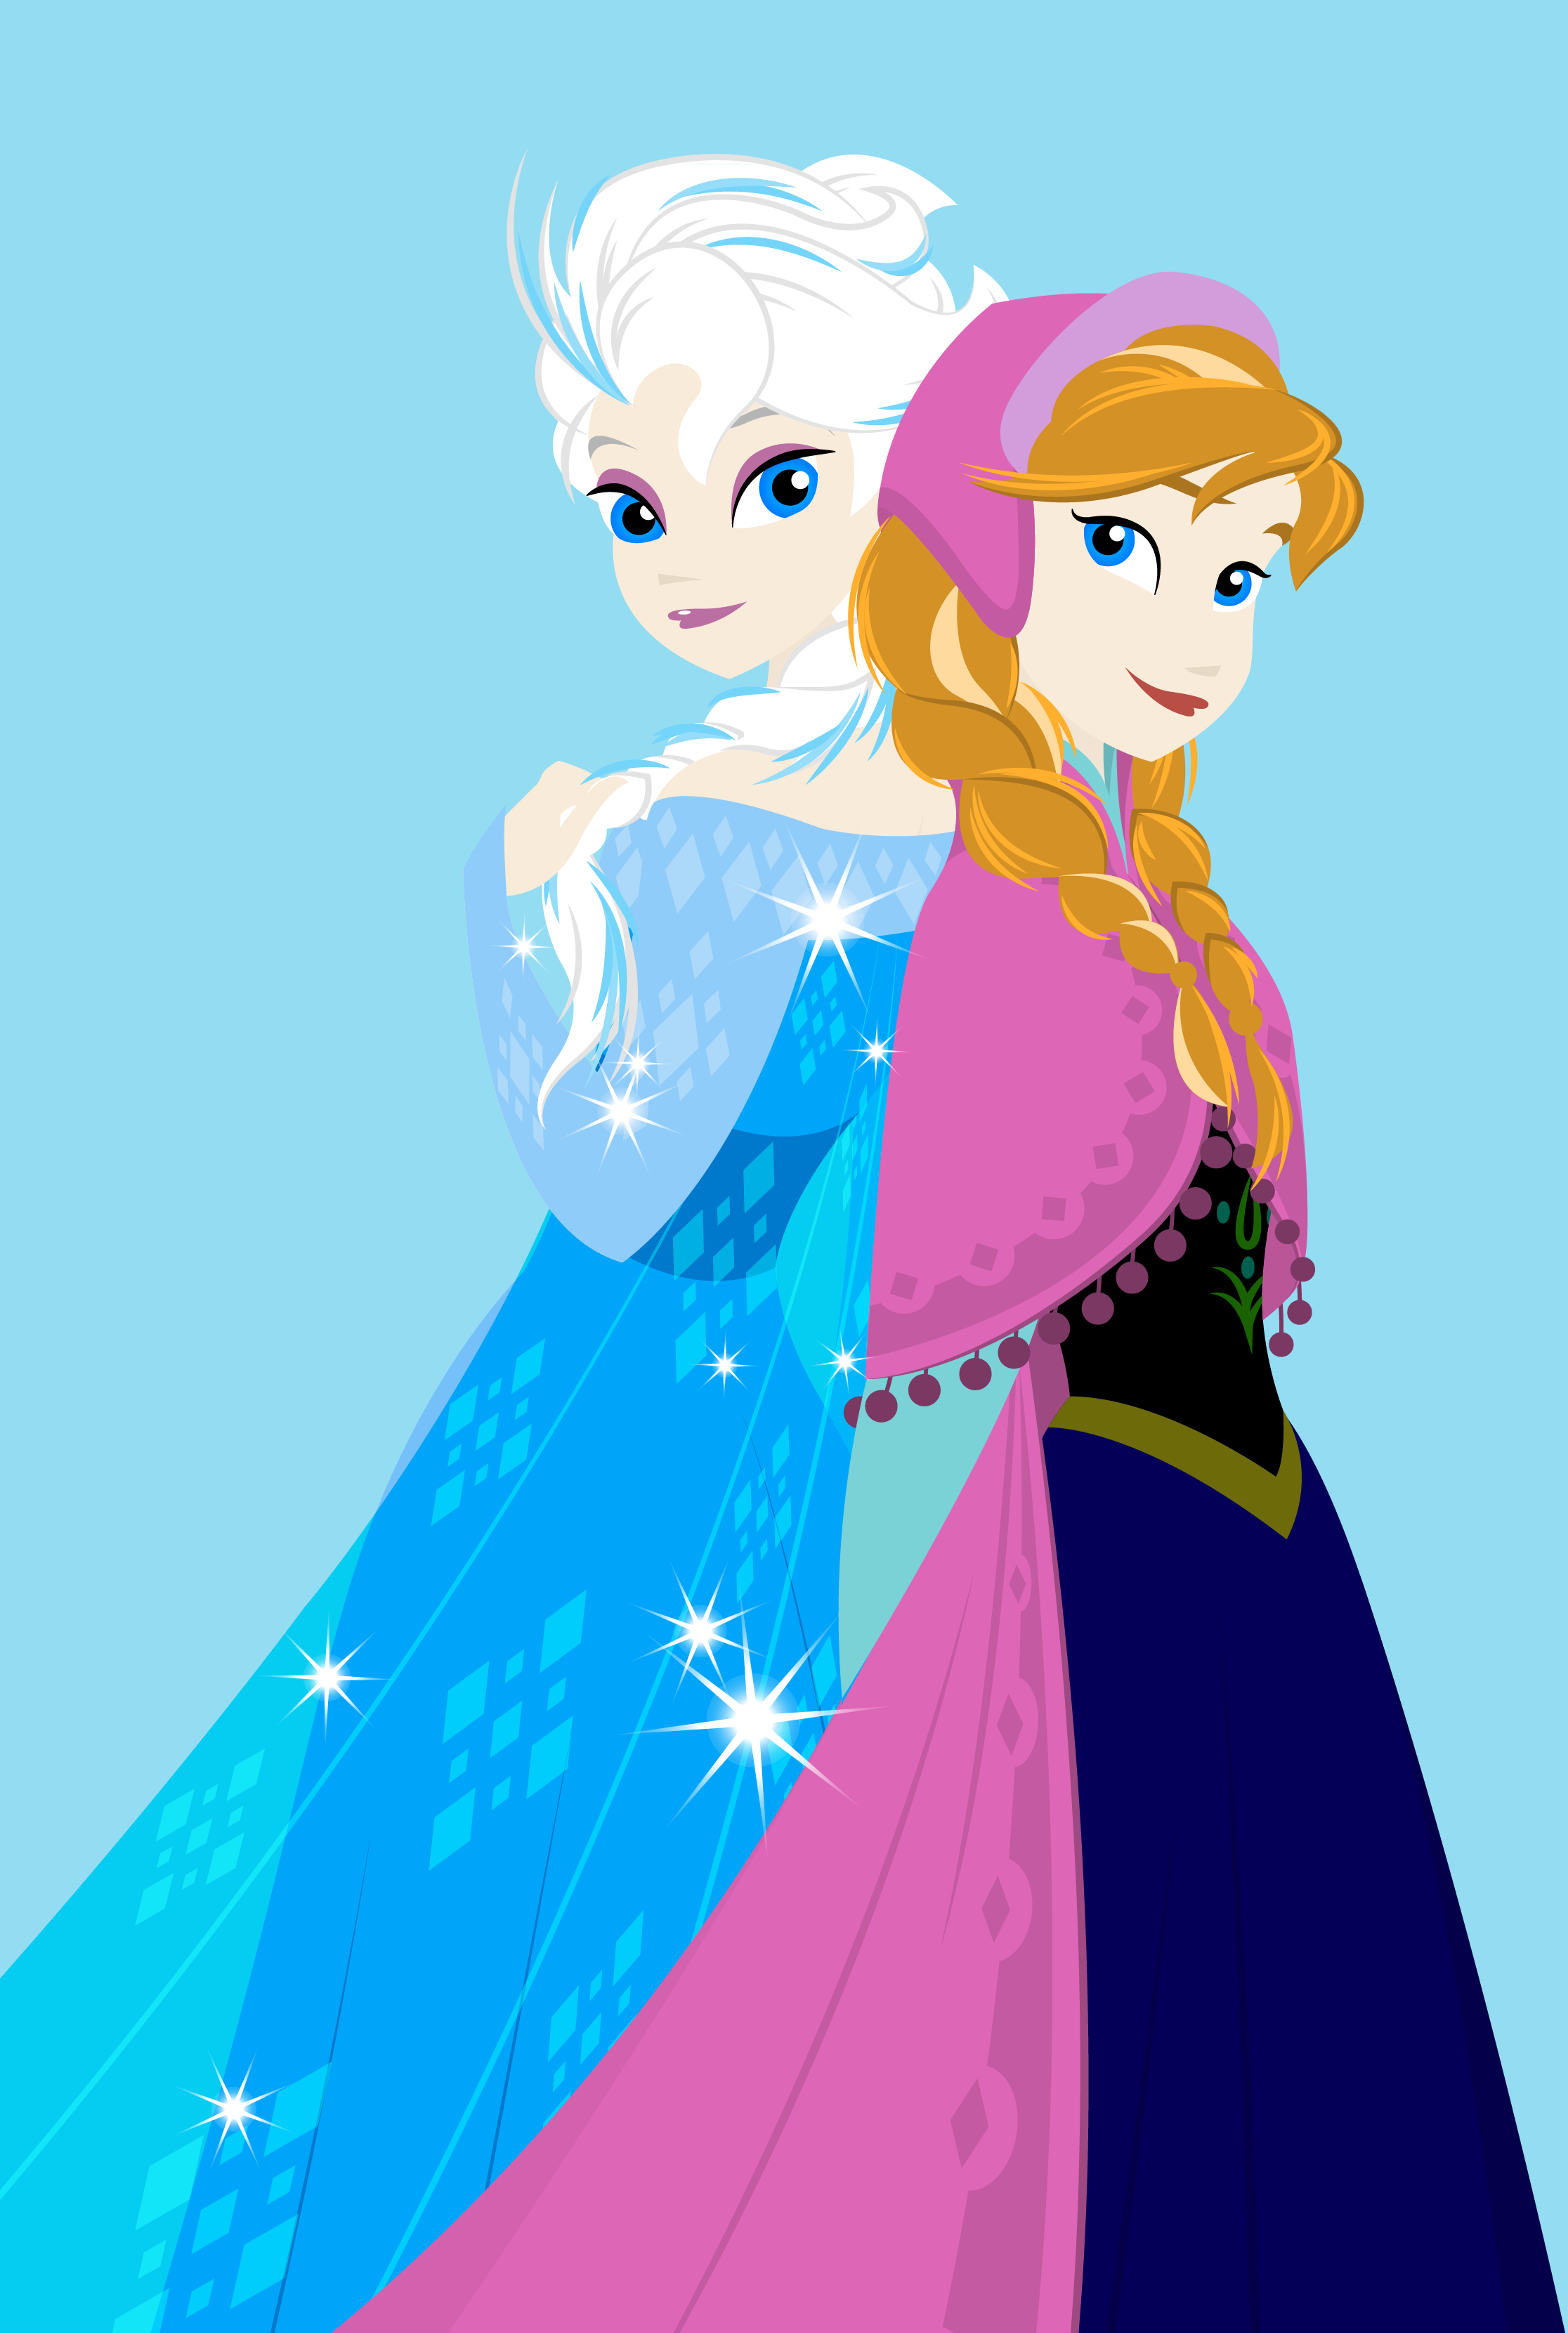 Alex2424121/My Fan Made Artwork of Disney